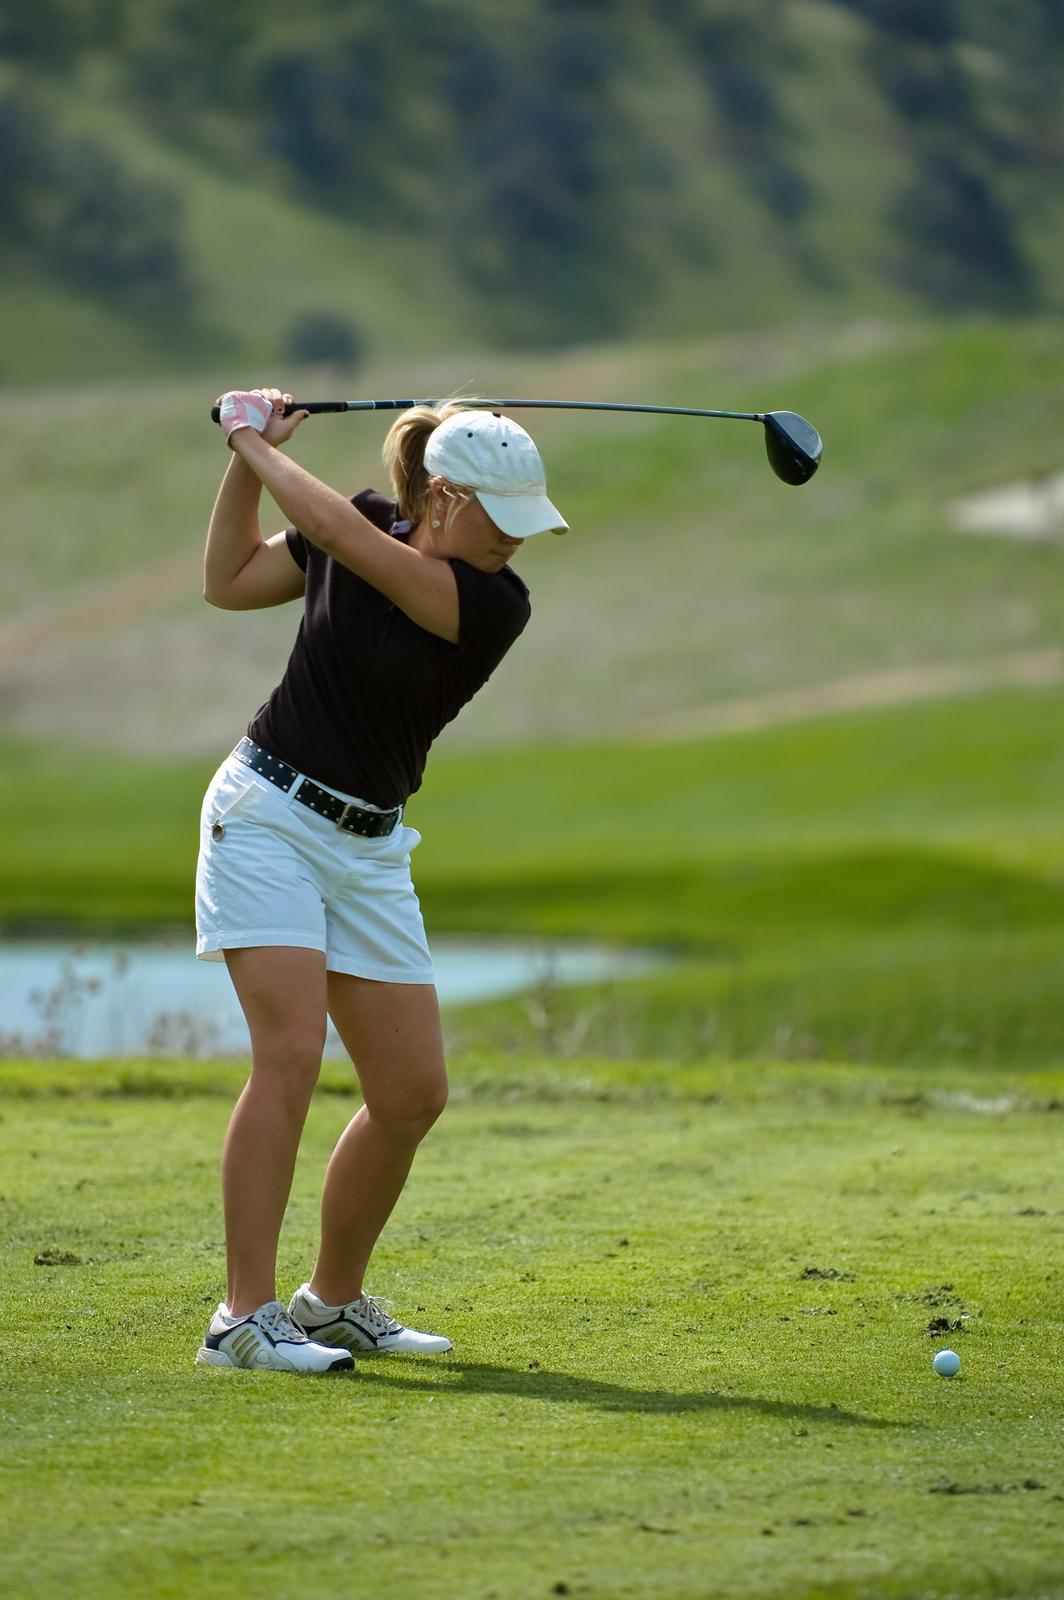 Woman_Golfer_Swinging_A_Driver_4948607.jpg